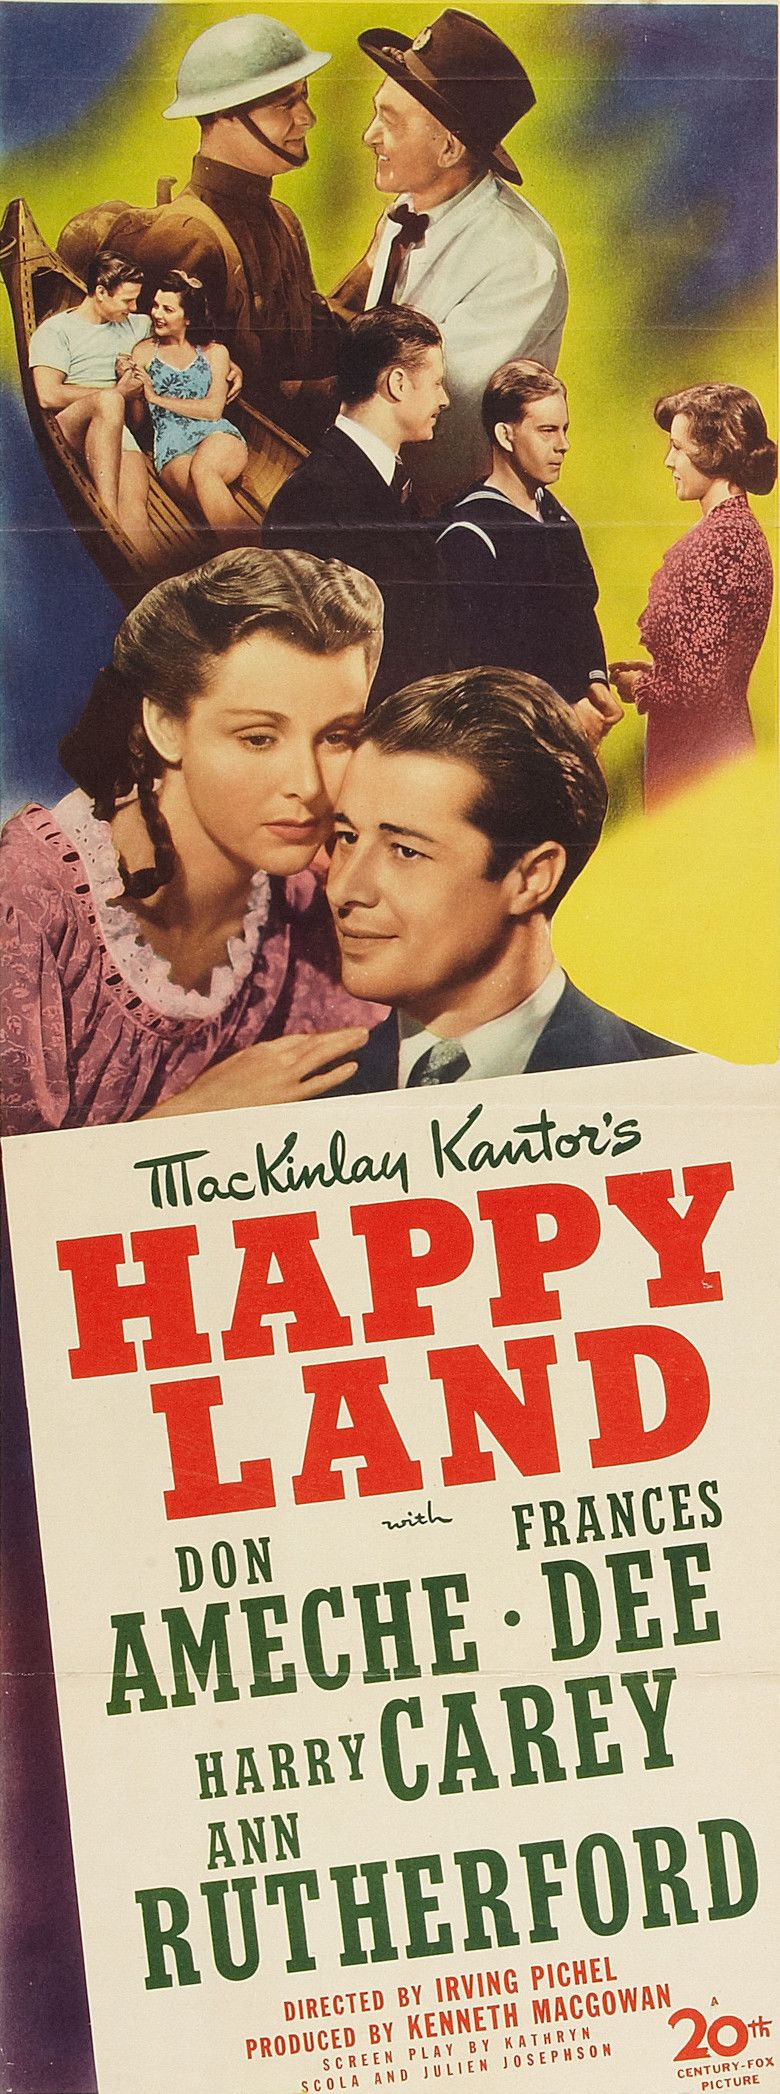 Happy Land (film) movie poster